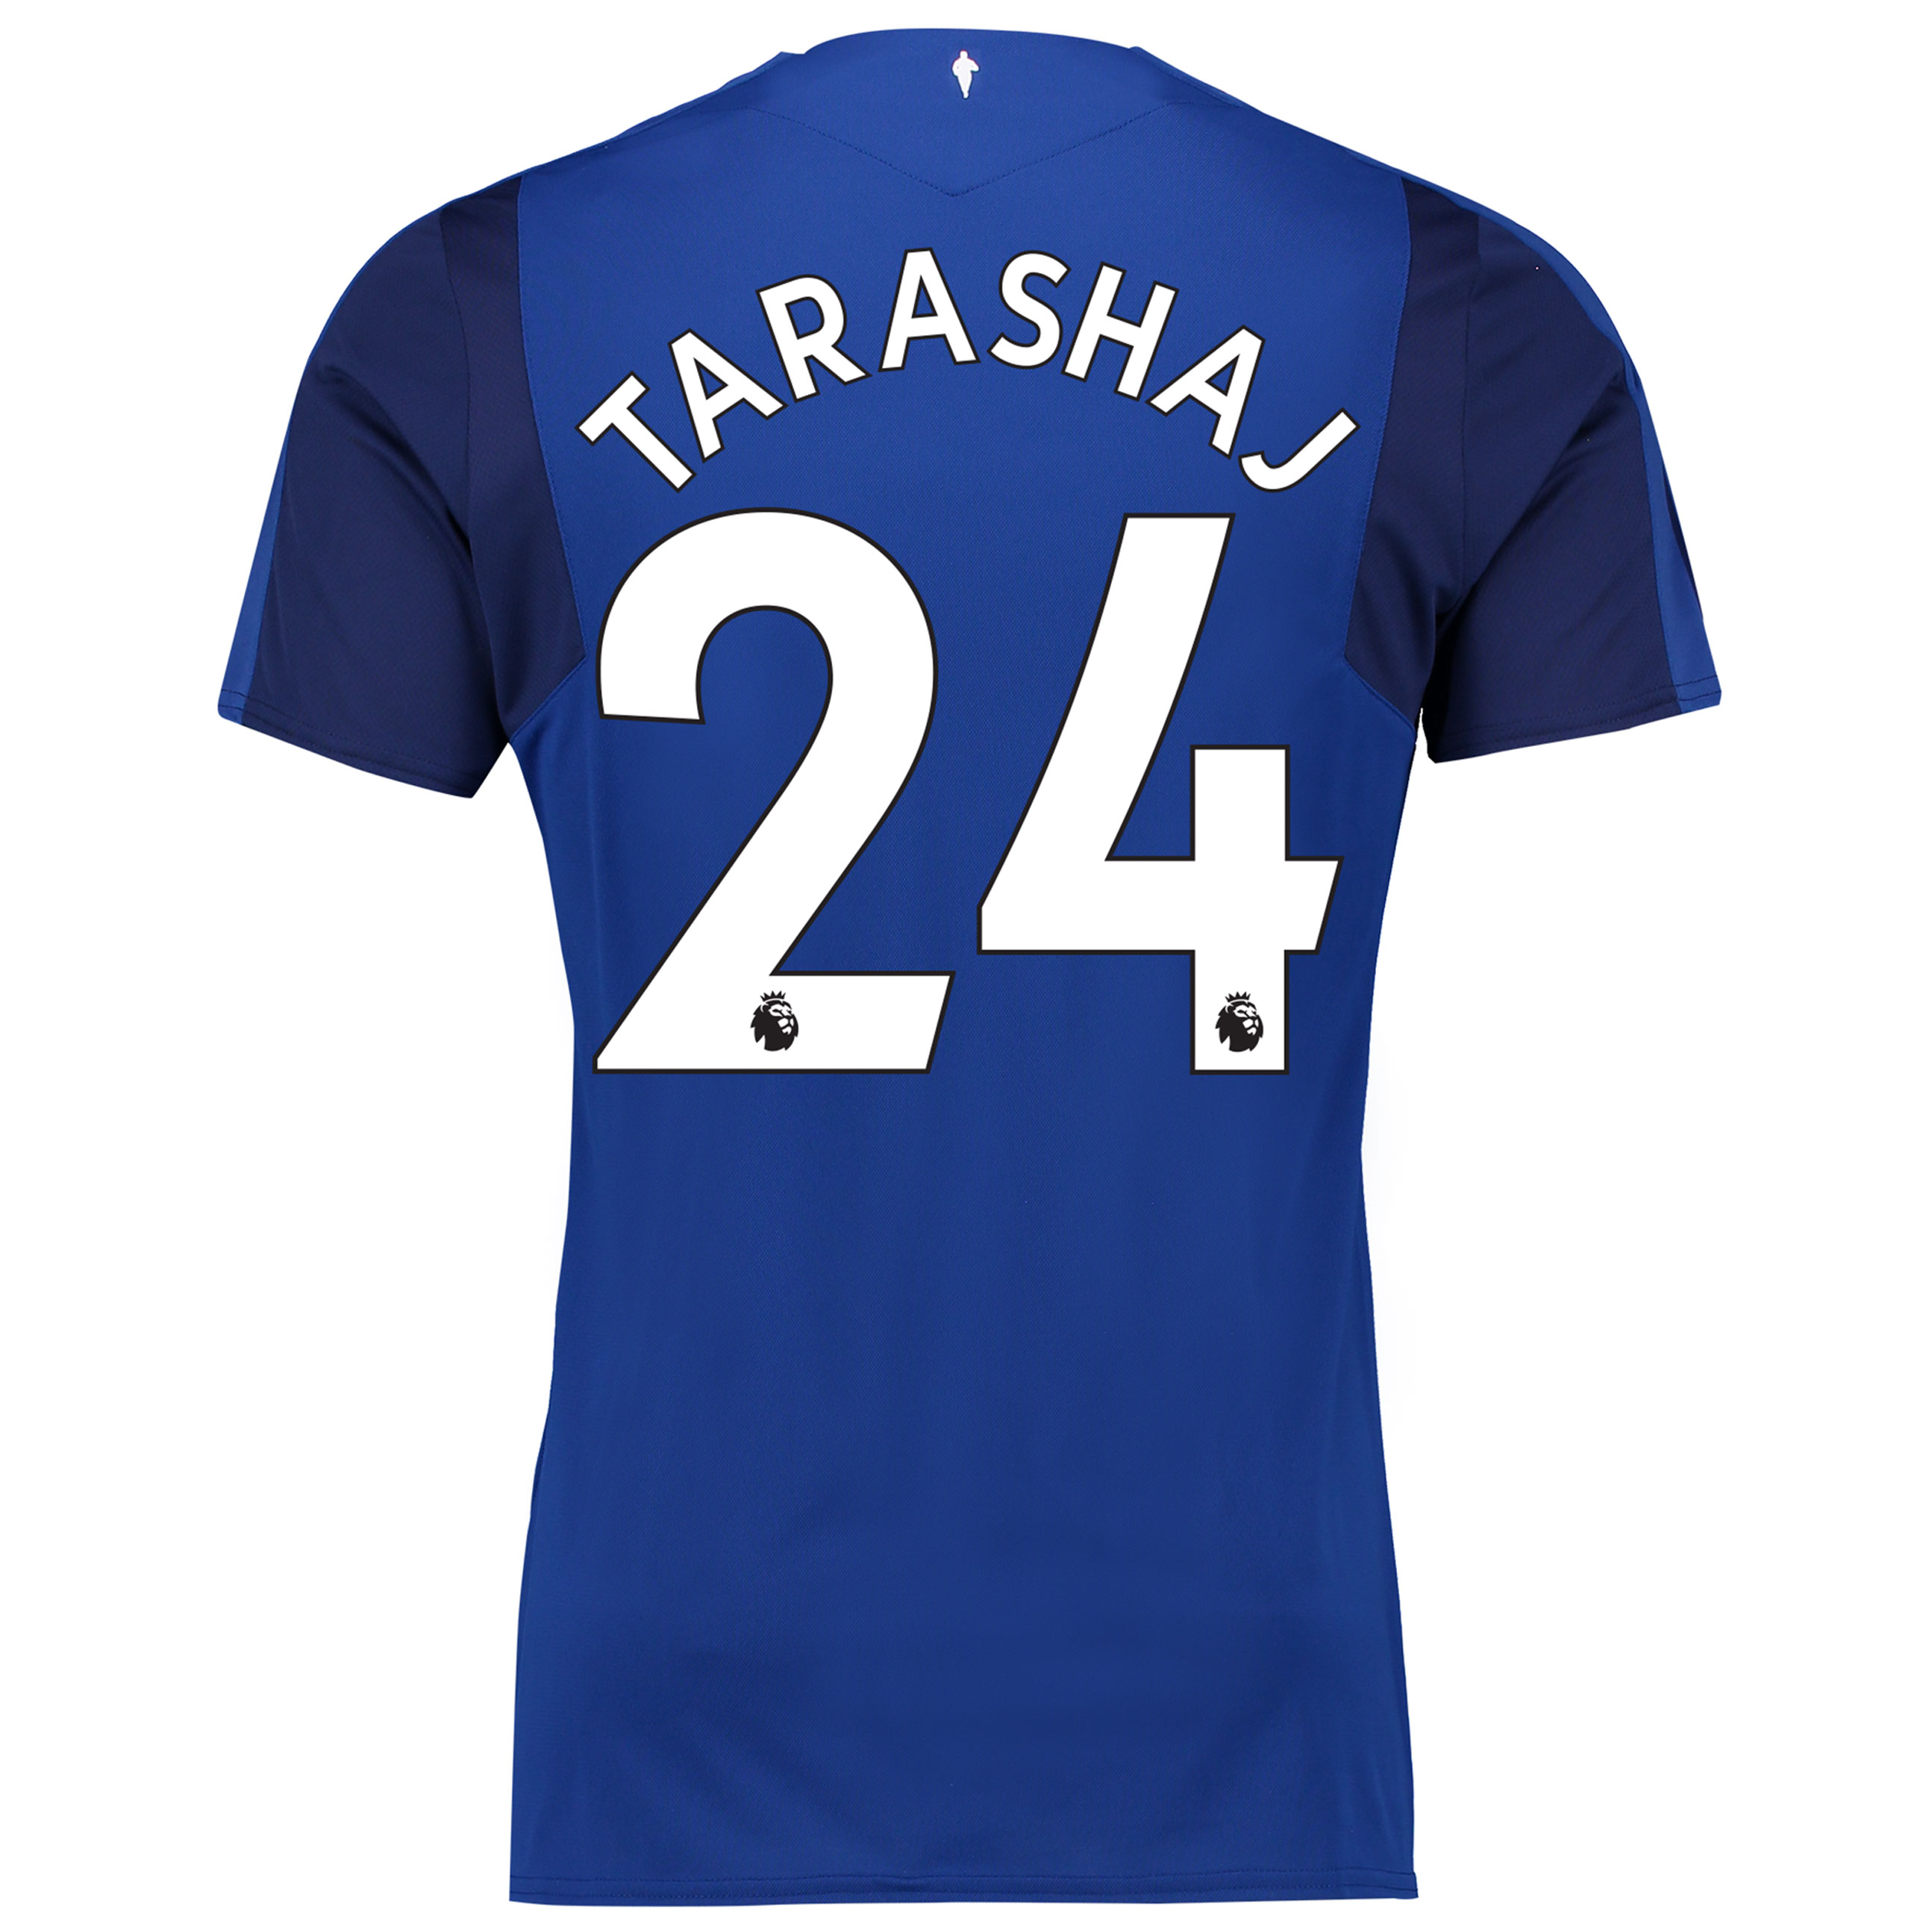 Everton Home Shirt 2017/18 - Junior with Tarashaj 24 printing